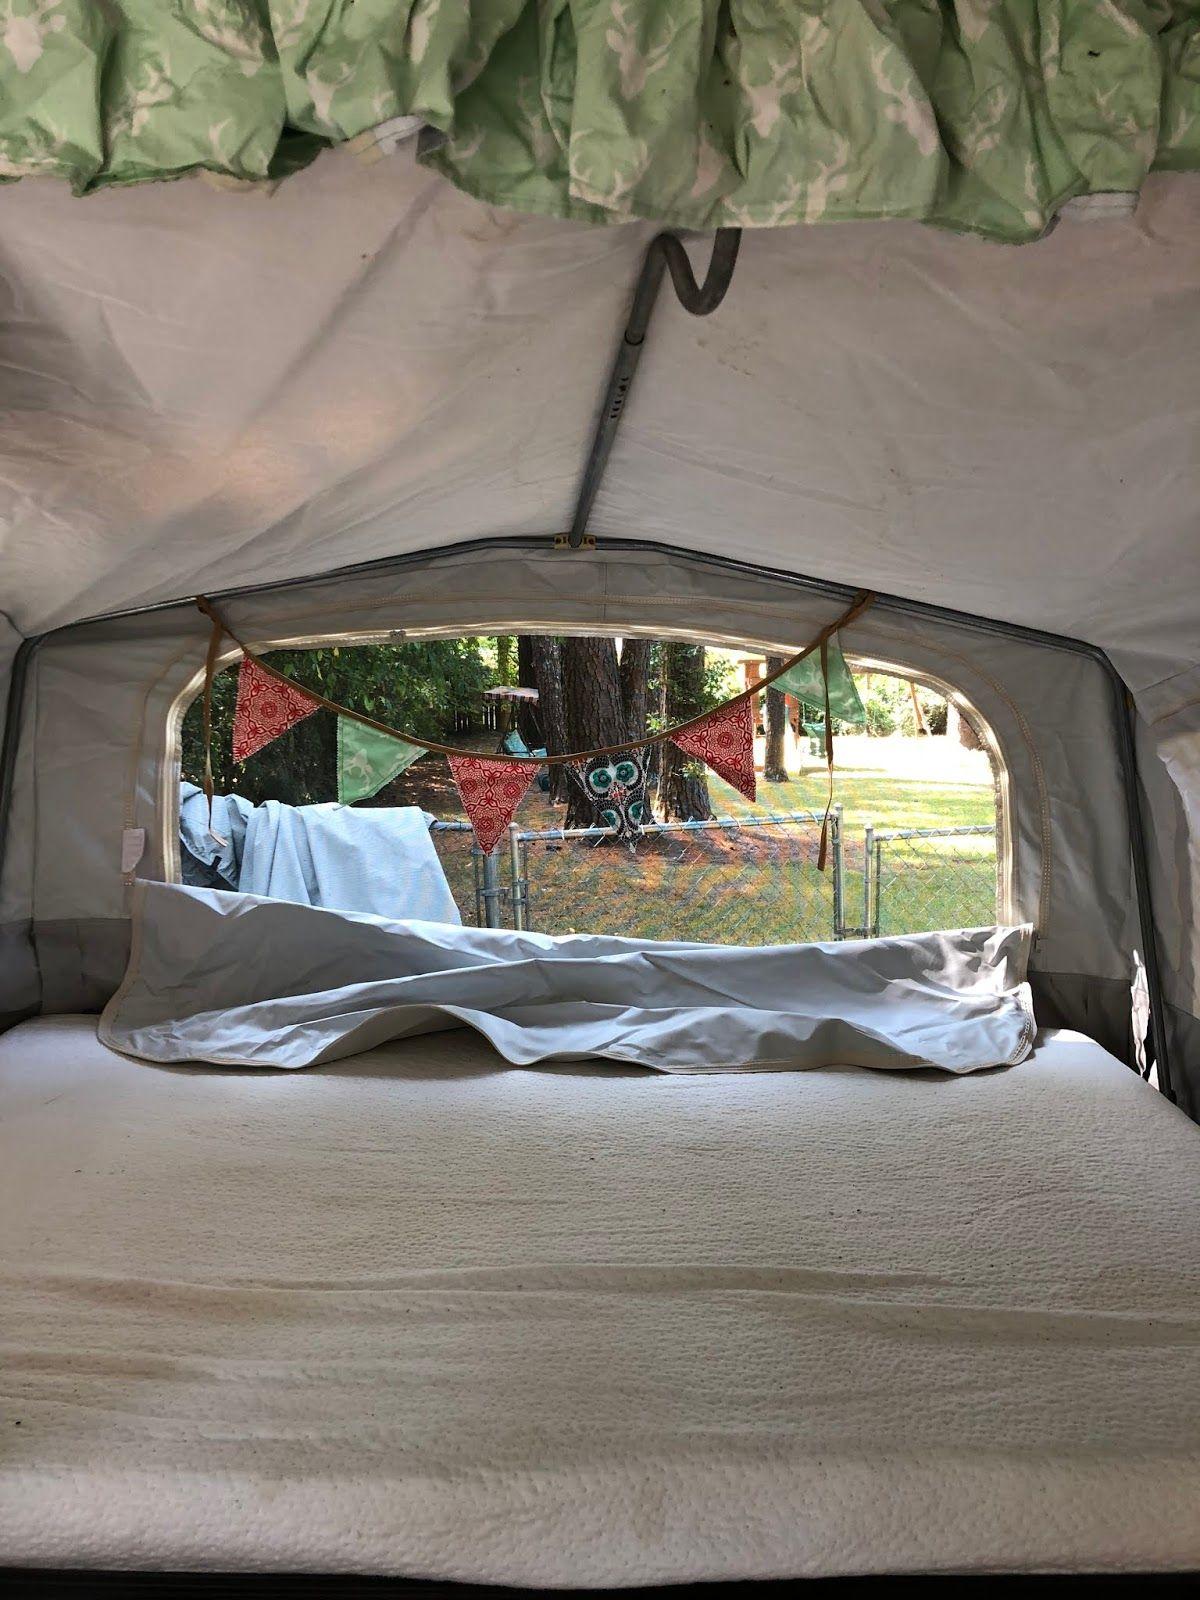 Annual Rv Maintenance For Your Pop Up Camper Pop Up Tent Trailer Camper Flooring Pop Up